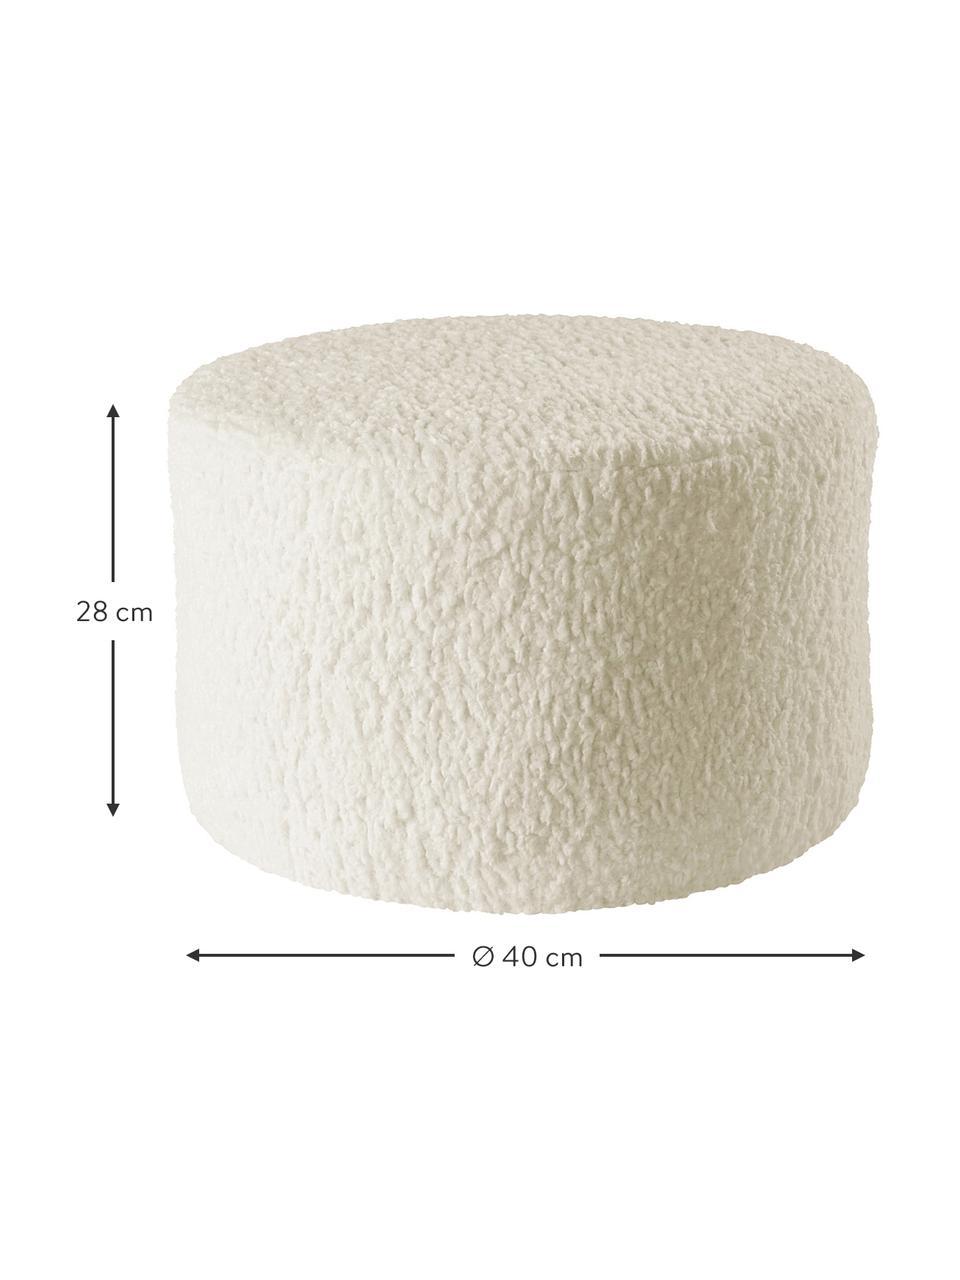 Kinder-Pouf Marella, Bezug: Polyester, Gestell: Holz, Cremeweiß, Ø 40 x H 28 cm